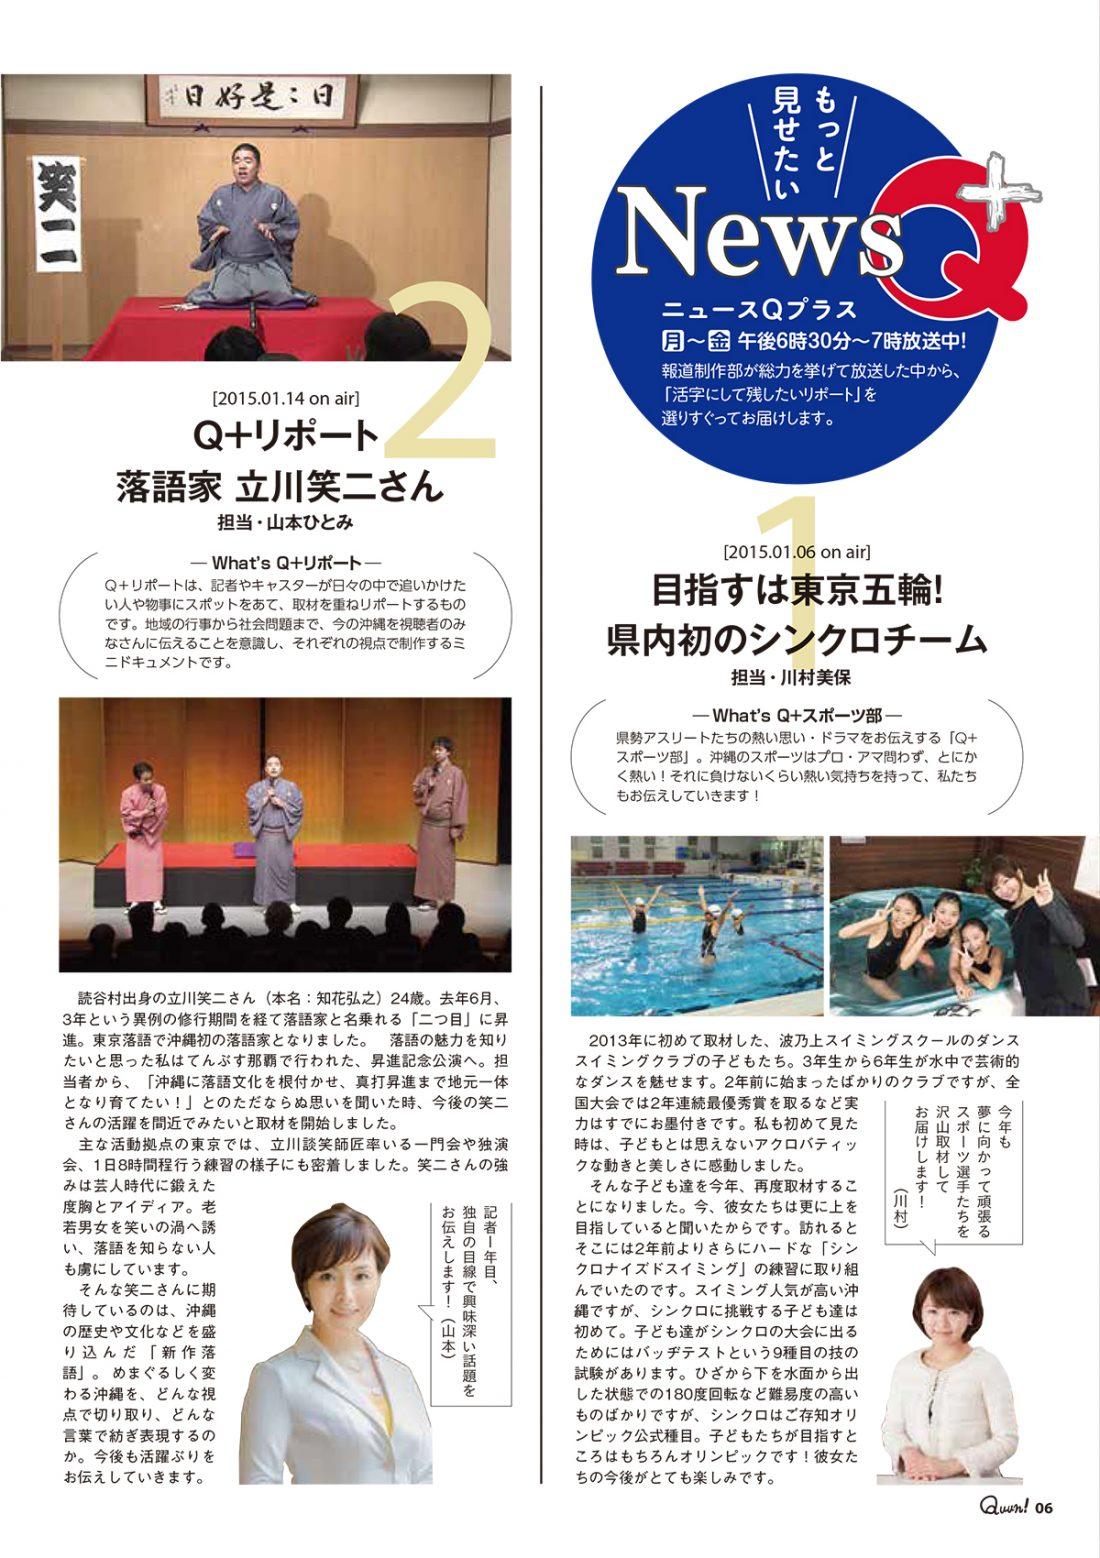 https://www.qab.co.jp/qgoro/wp-content/uploads/quun_0308-1100x1558.jpg